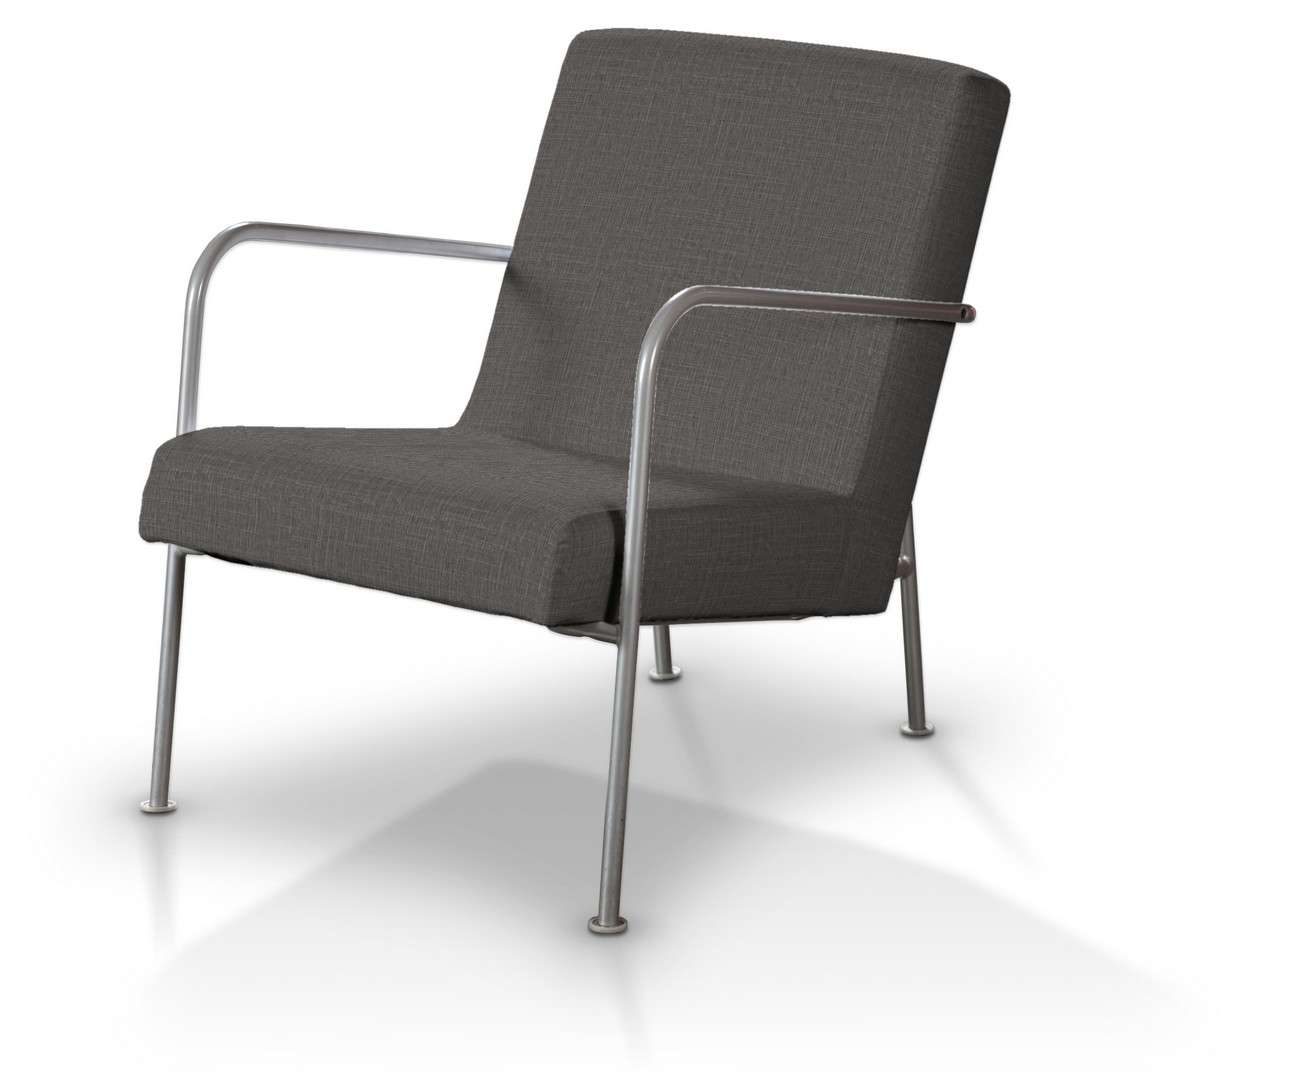 Potah na křeslo Ikea PS v kolekci Living II, látka: 161-16